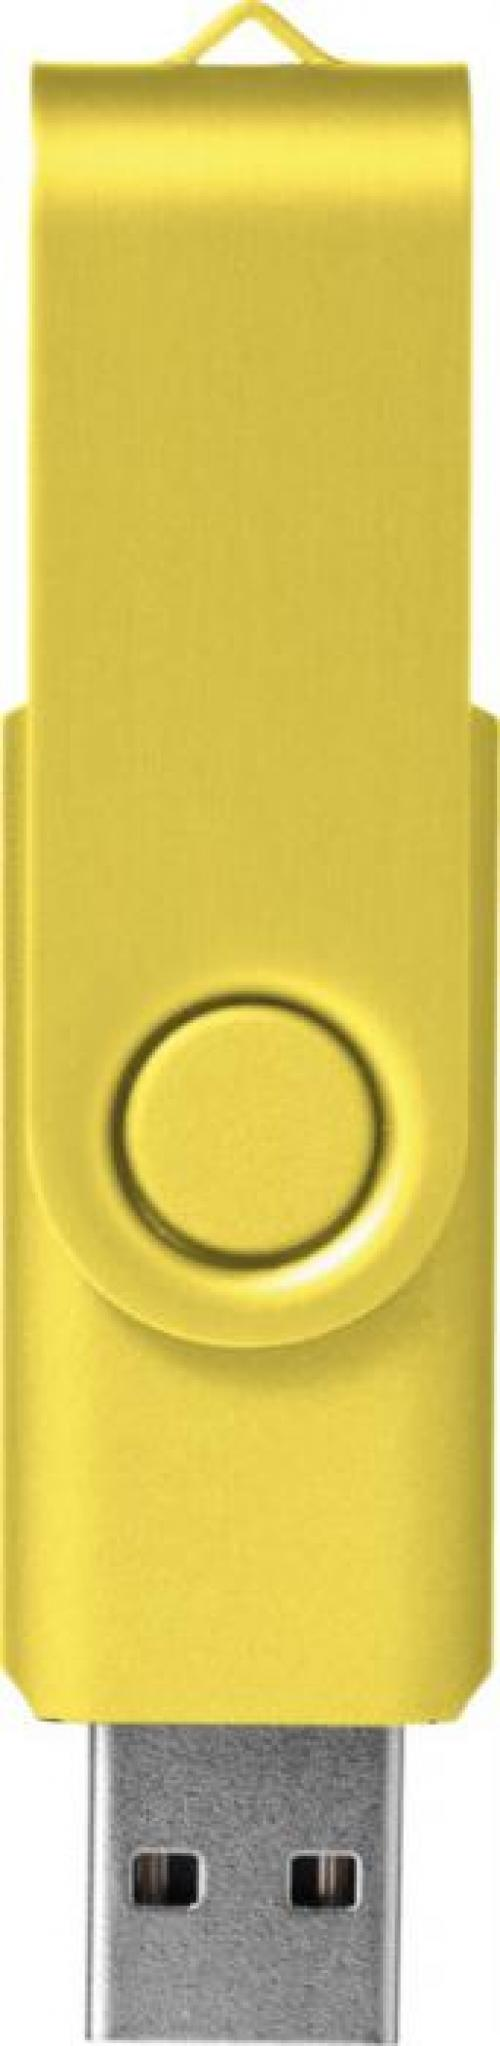 Memoria USB metálica 4gb Rotate